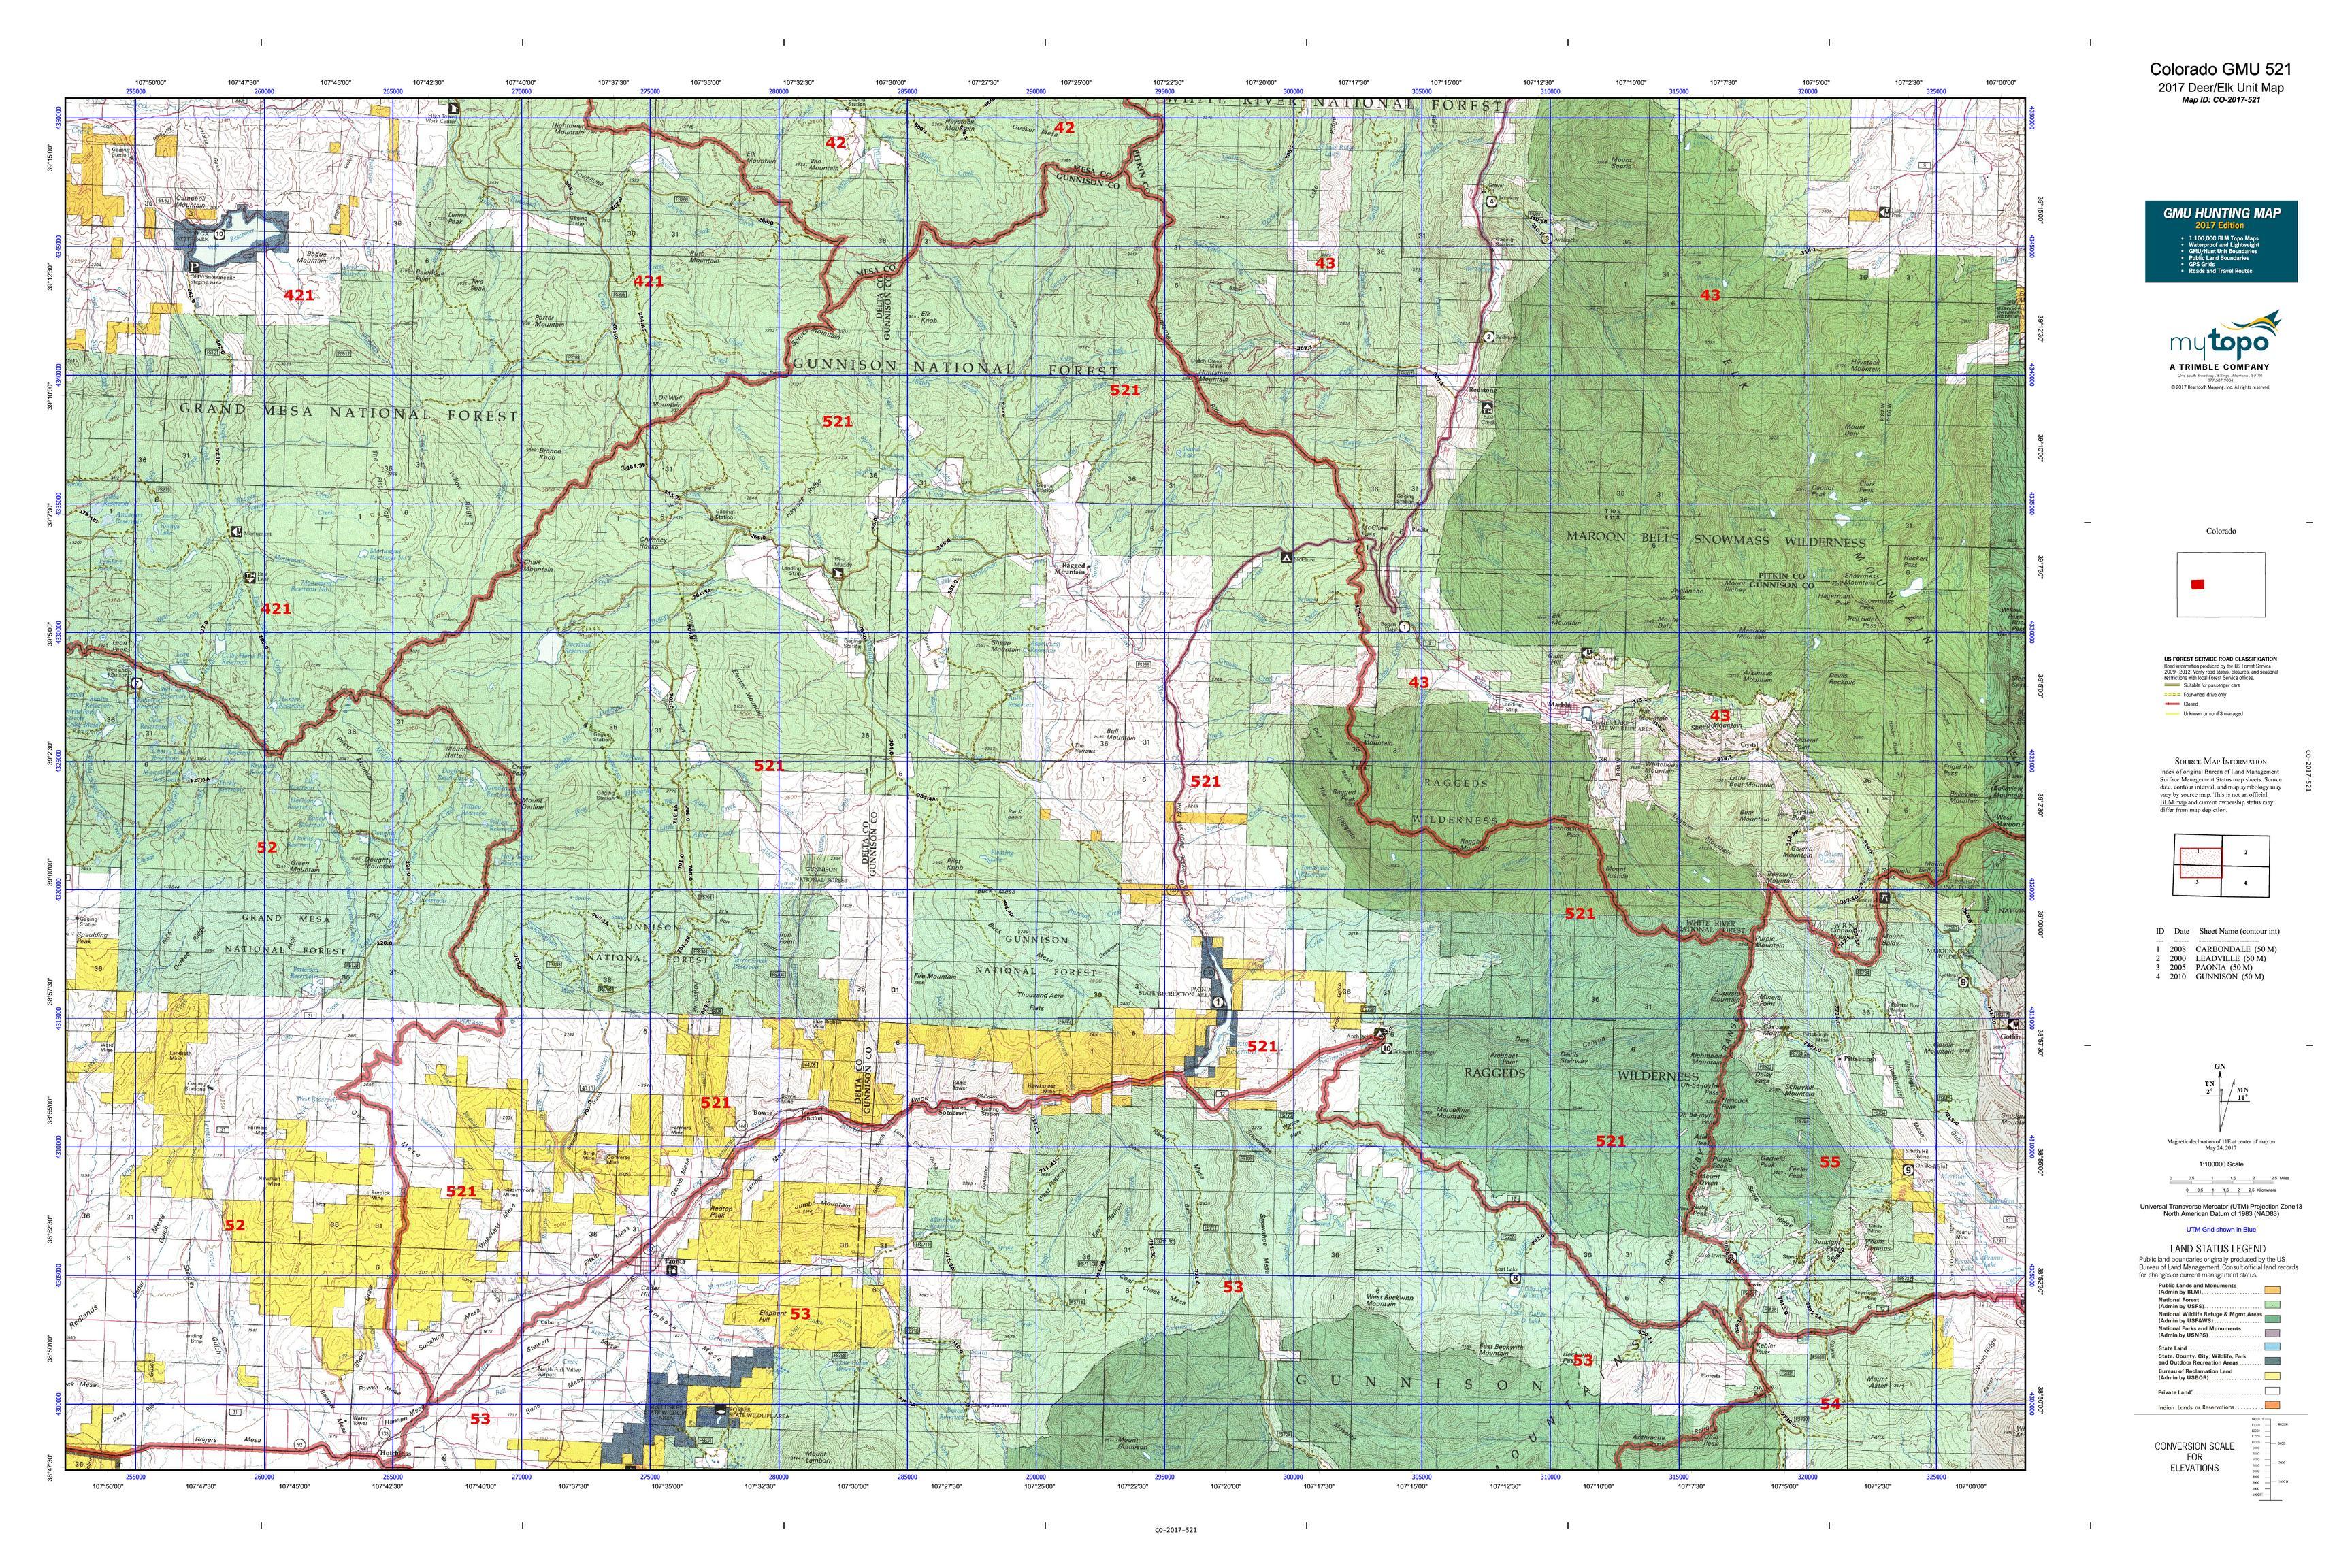 Colorado GMU 521 Map  MyTopo